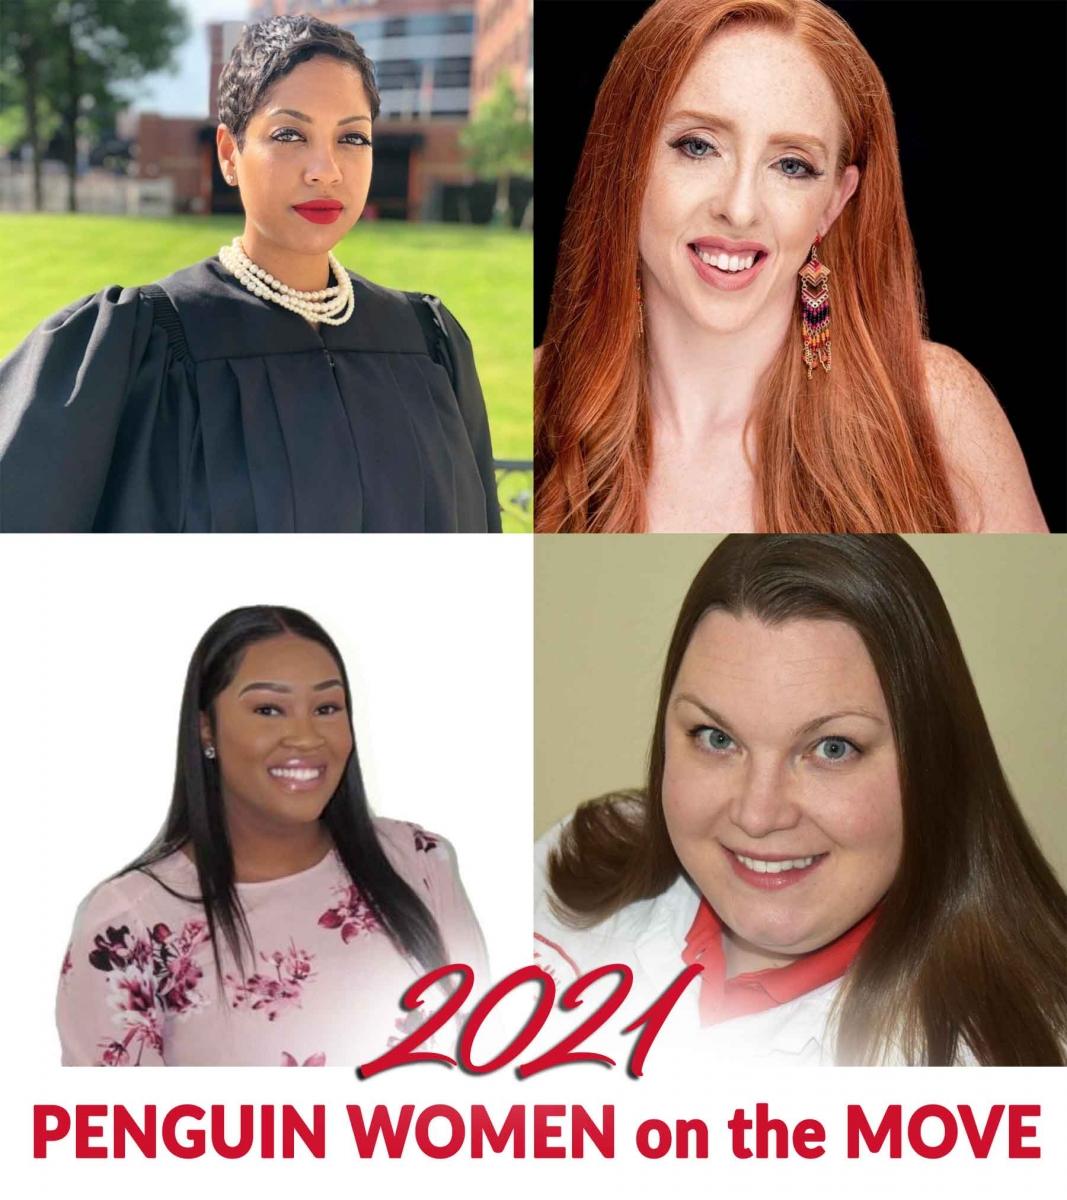 Penguin Women on the move